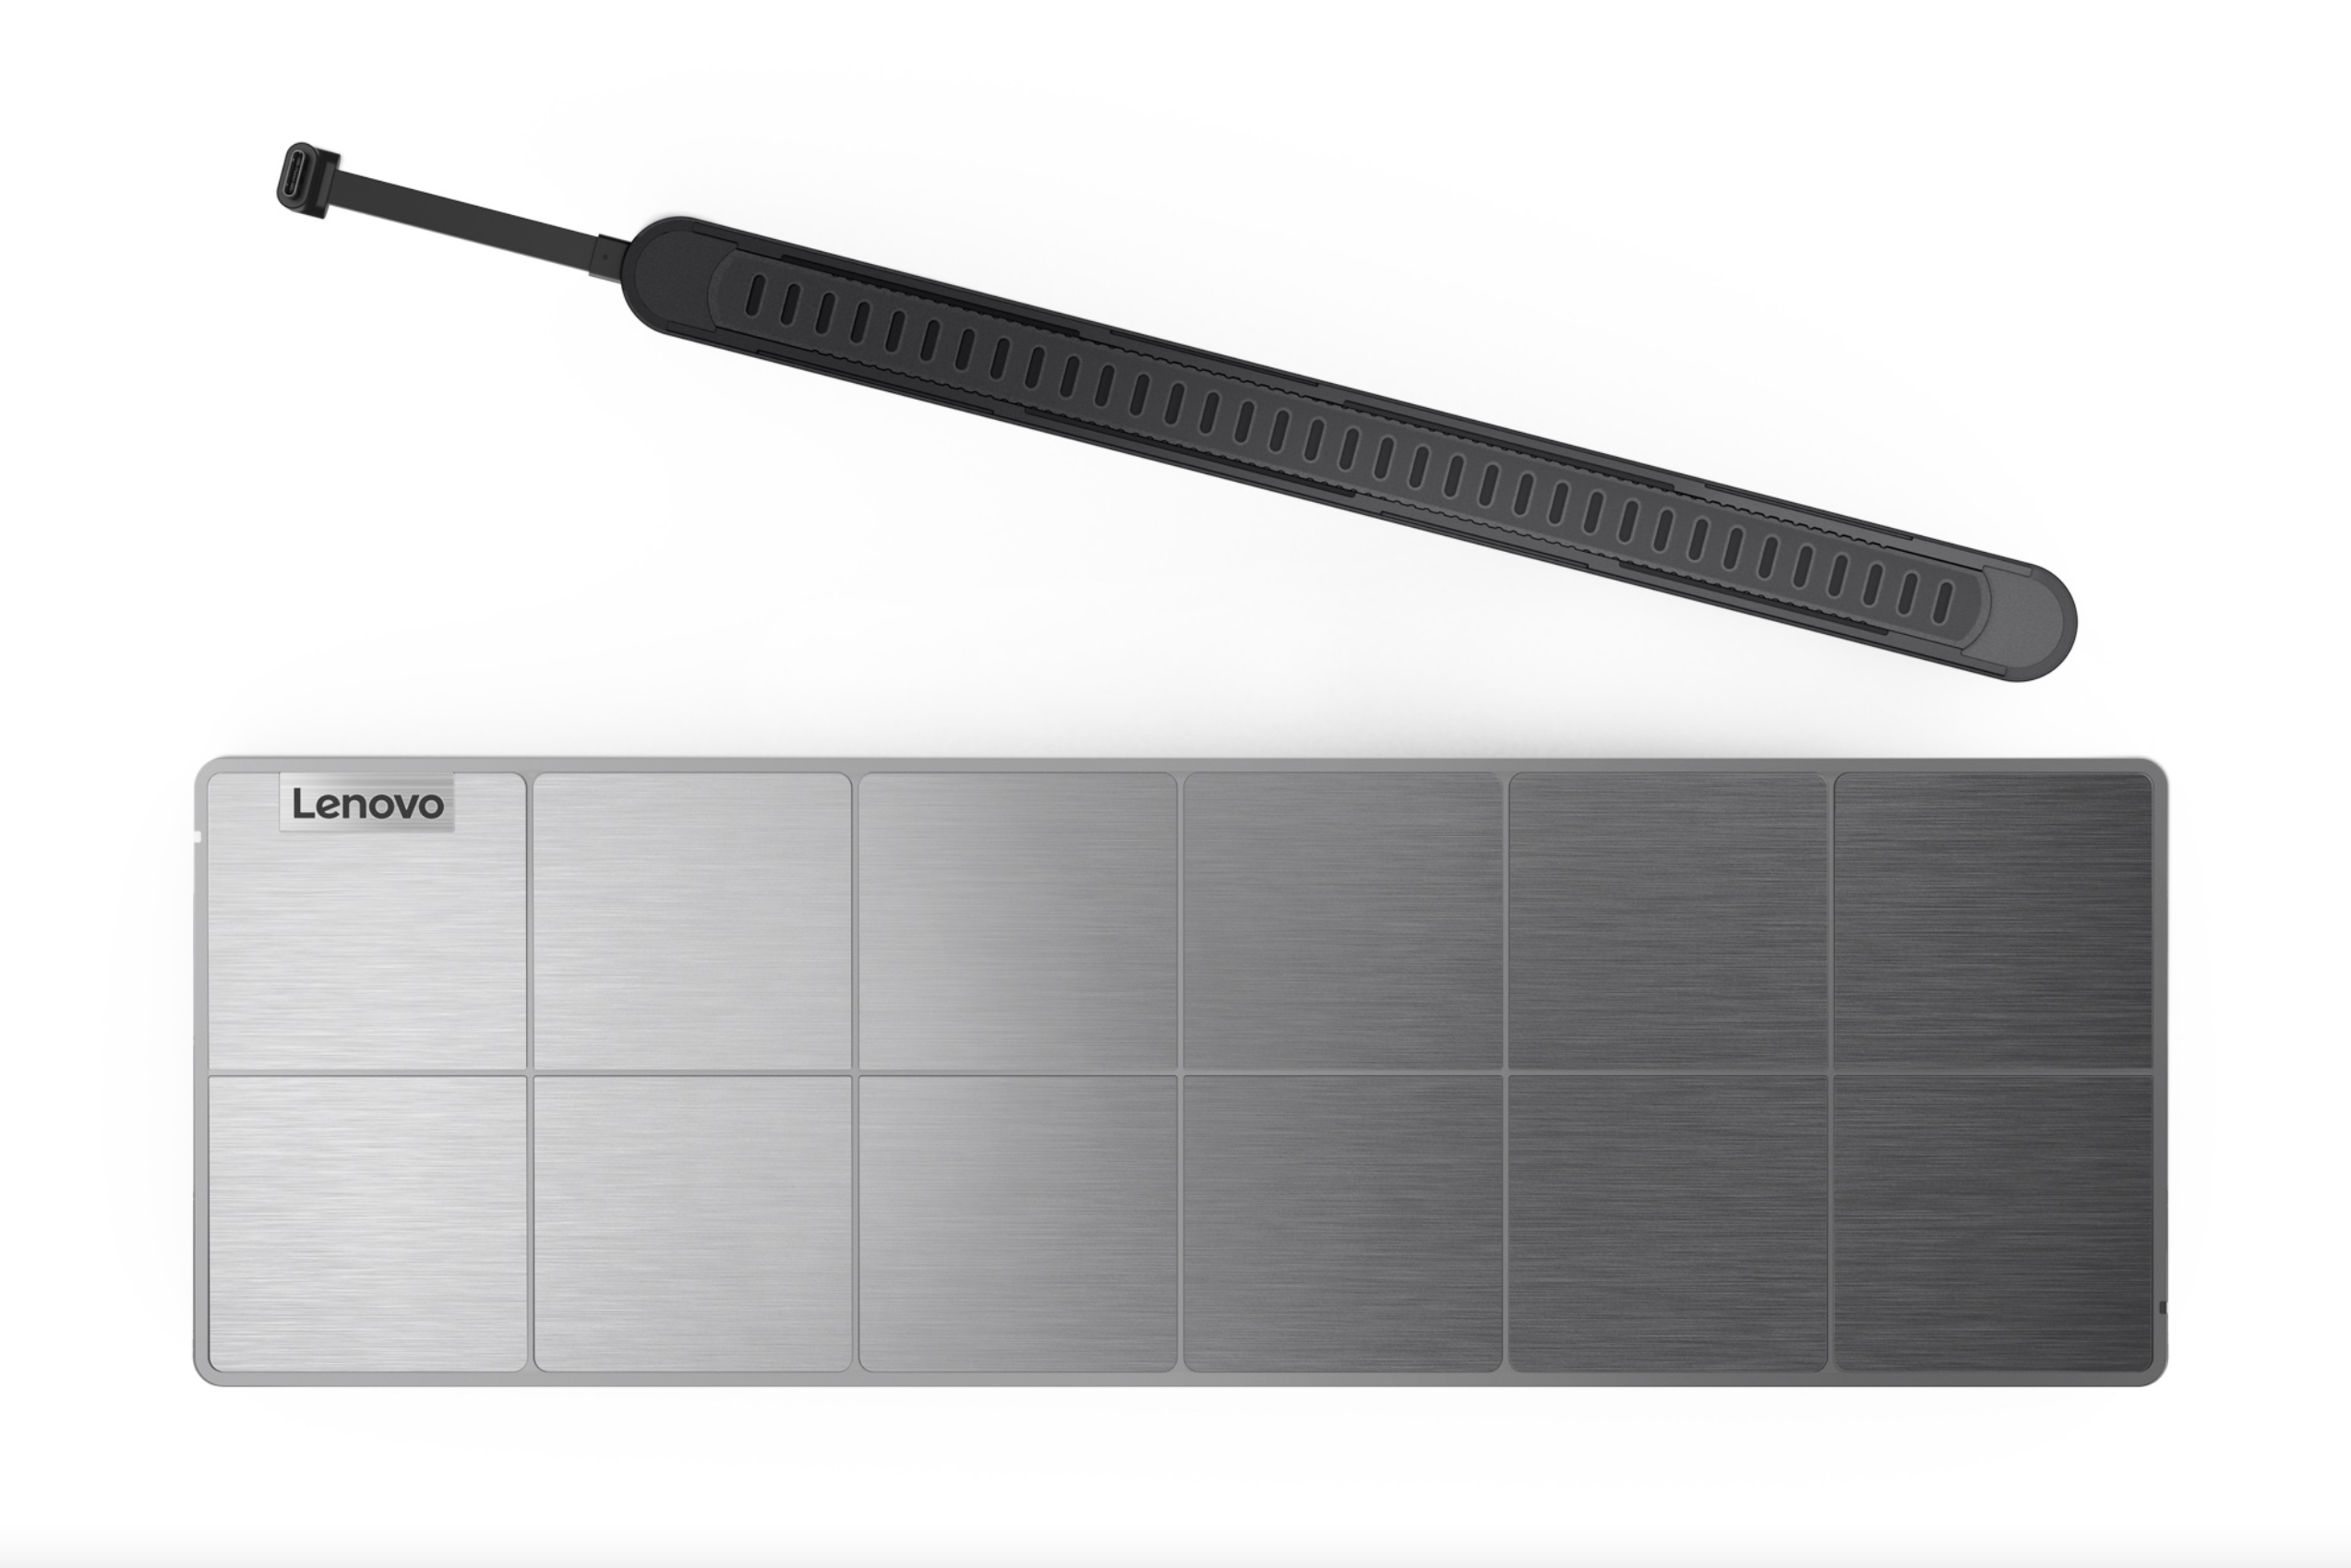 Lenovo wireless charging kit